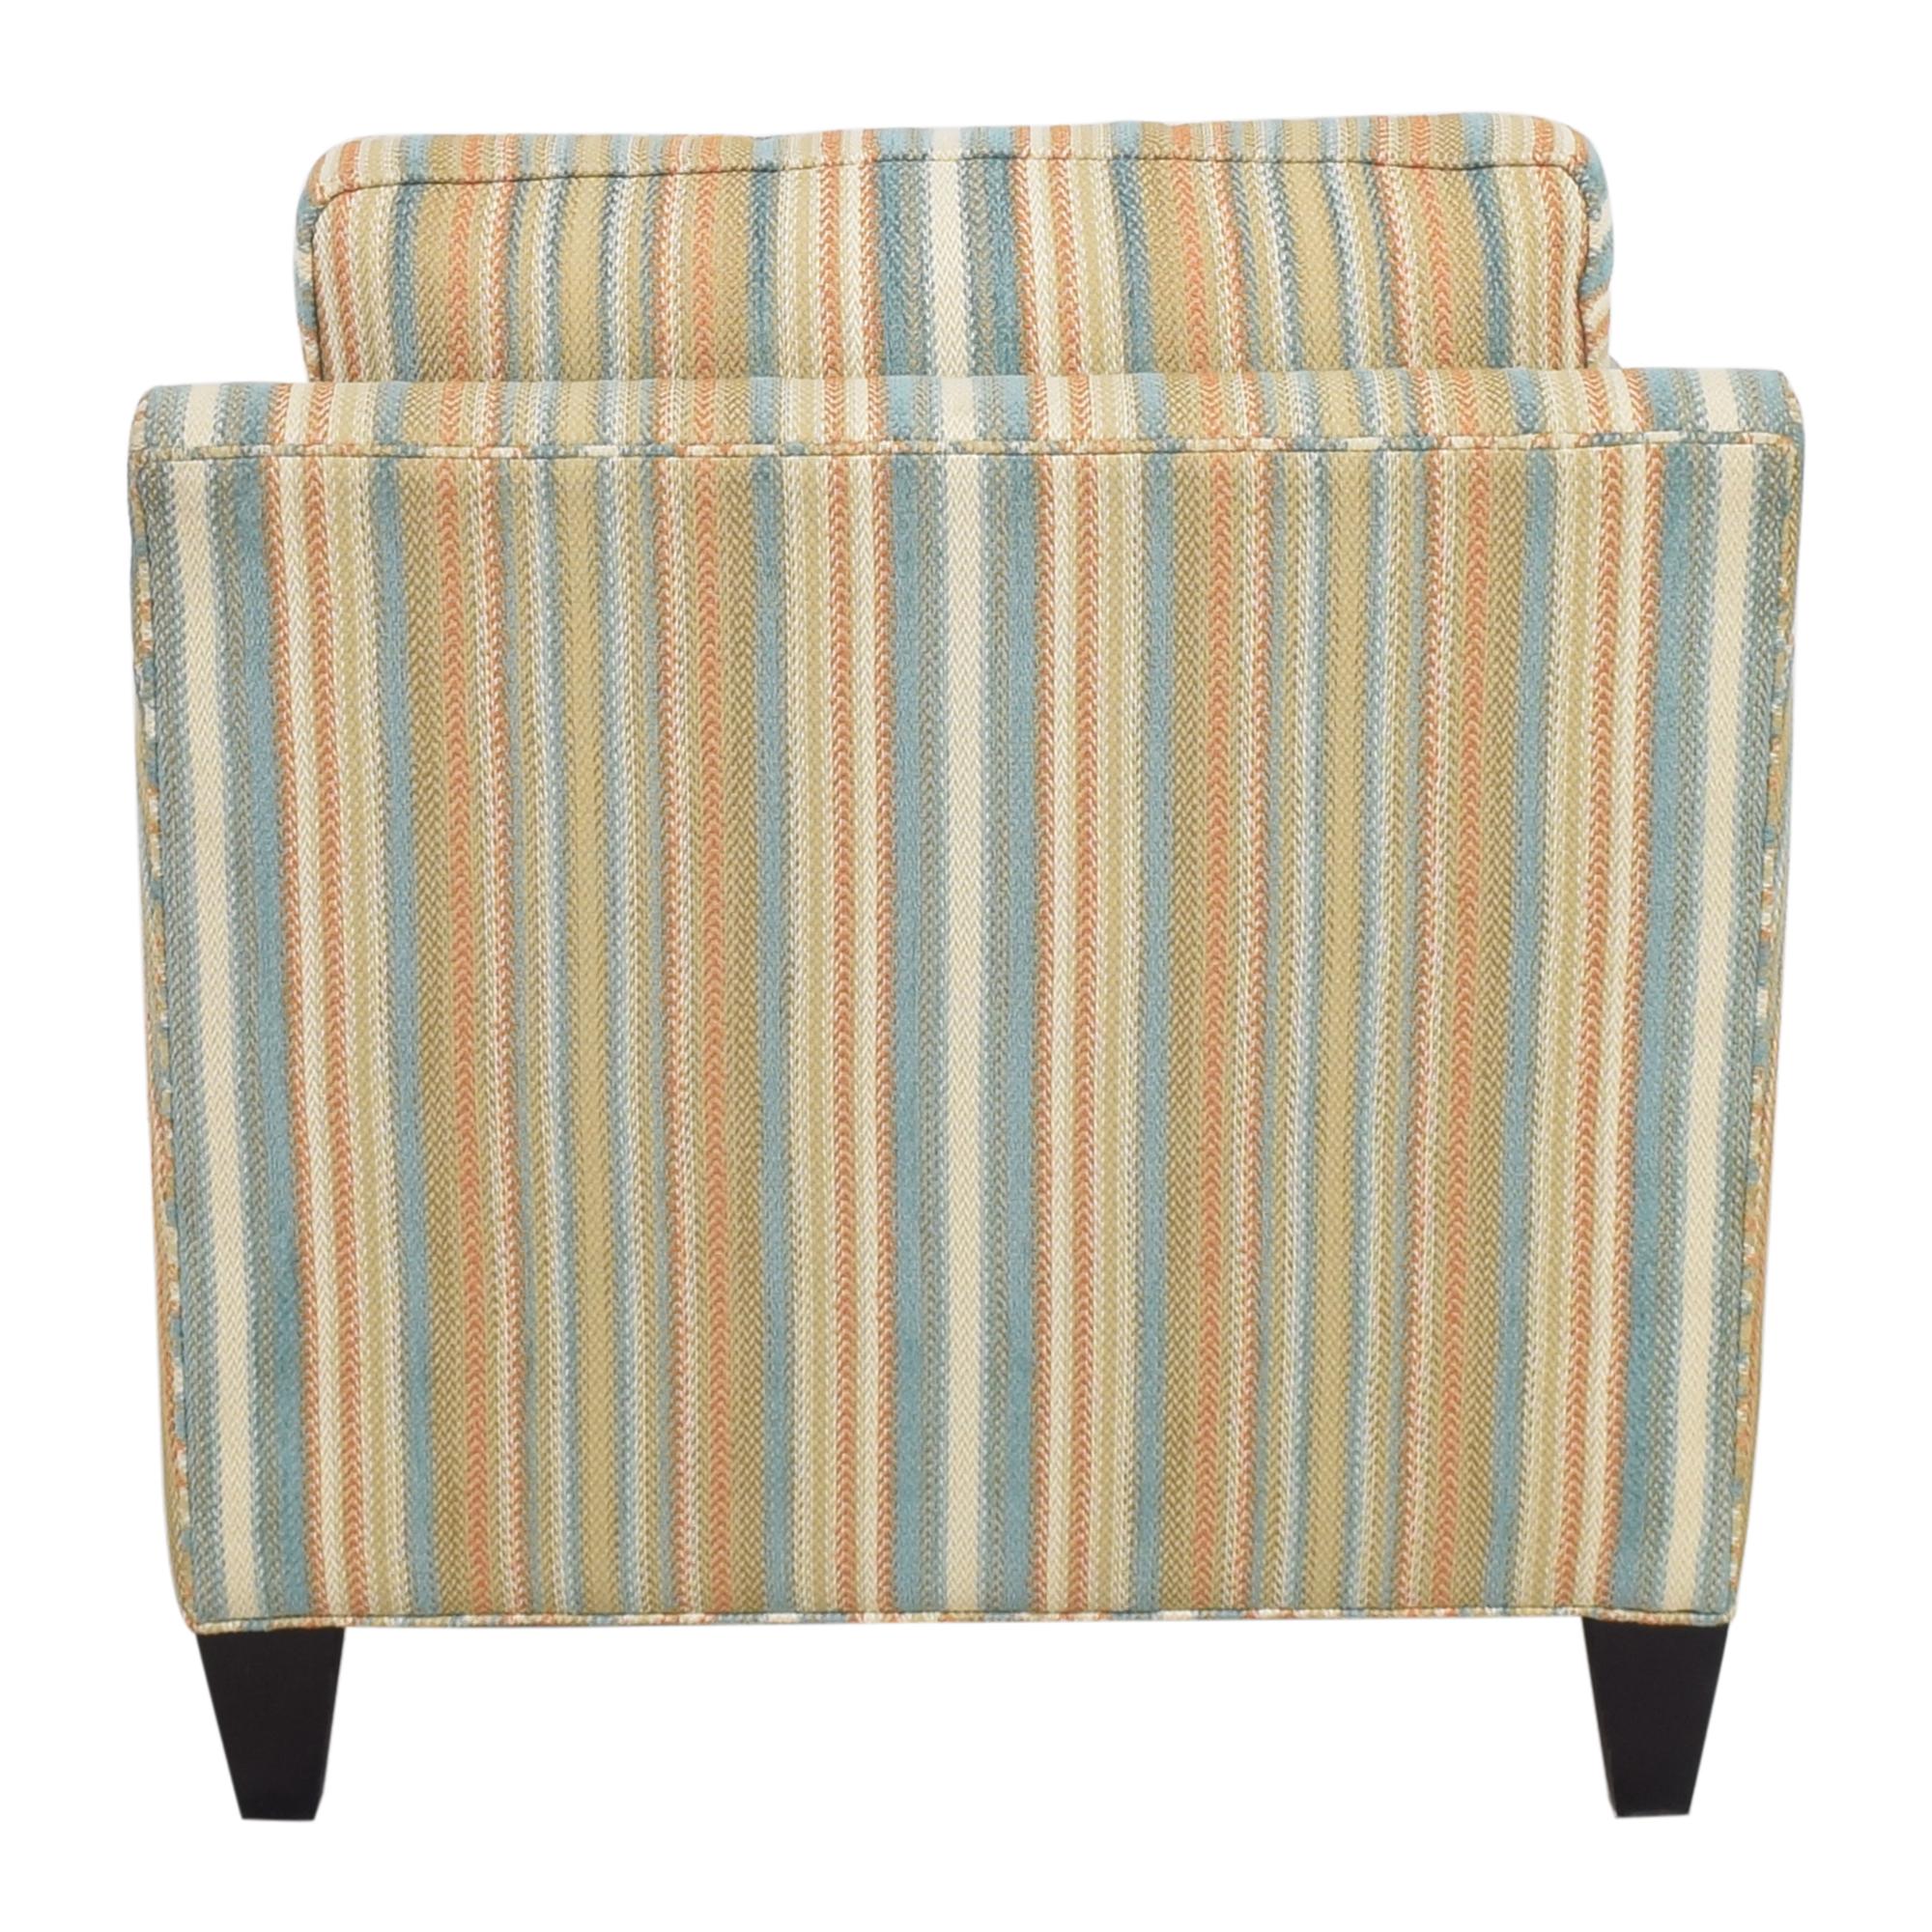 Thomasville Thomasville Striped Accent Chair ct